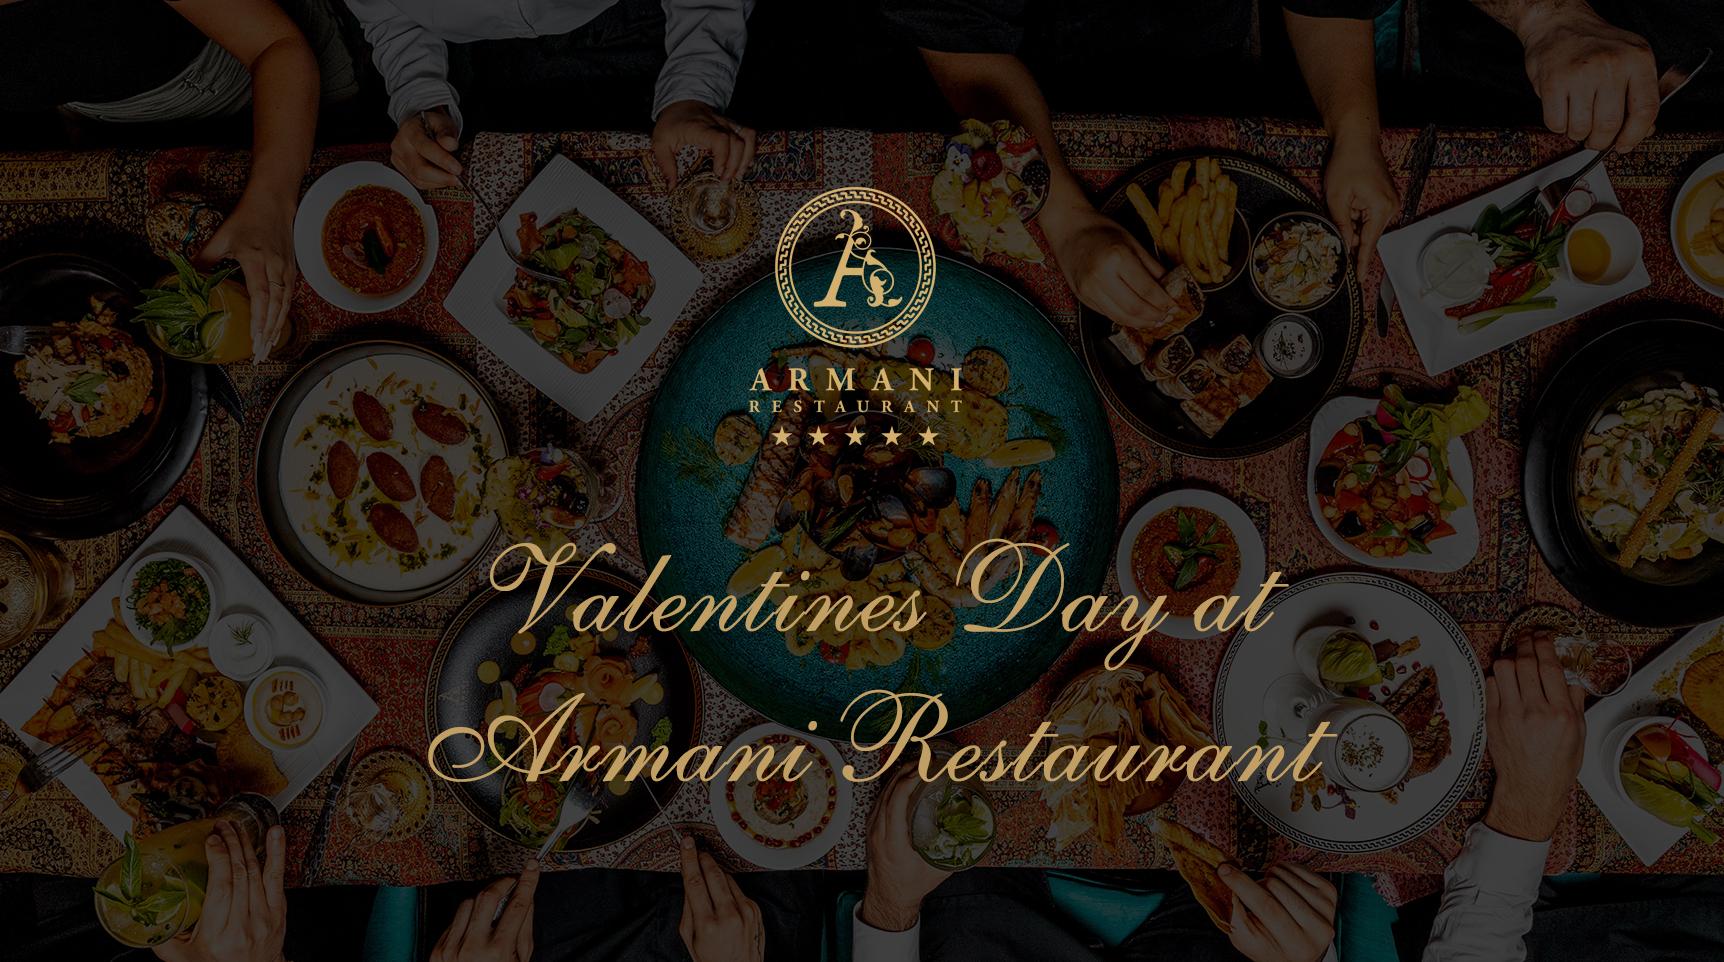 Valentines Day at Armani Restaurant